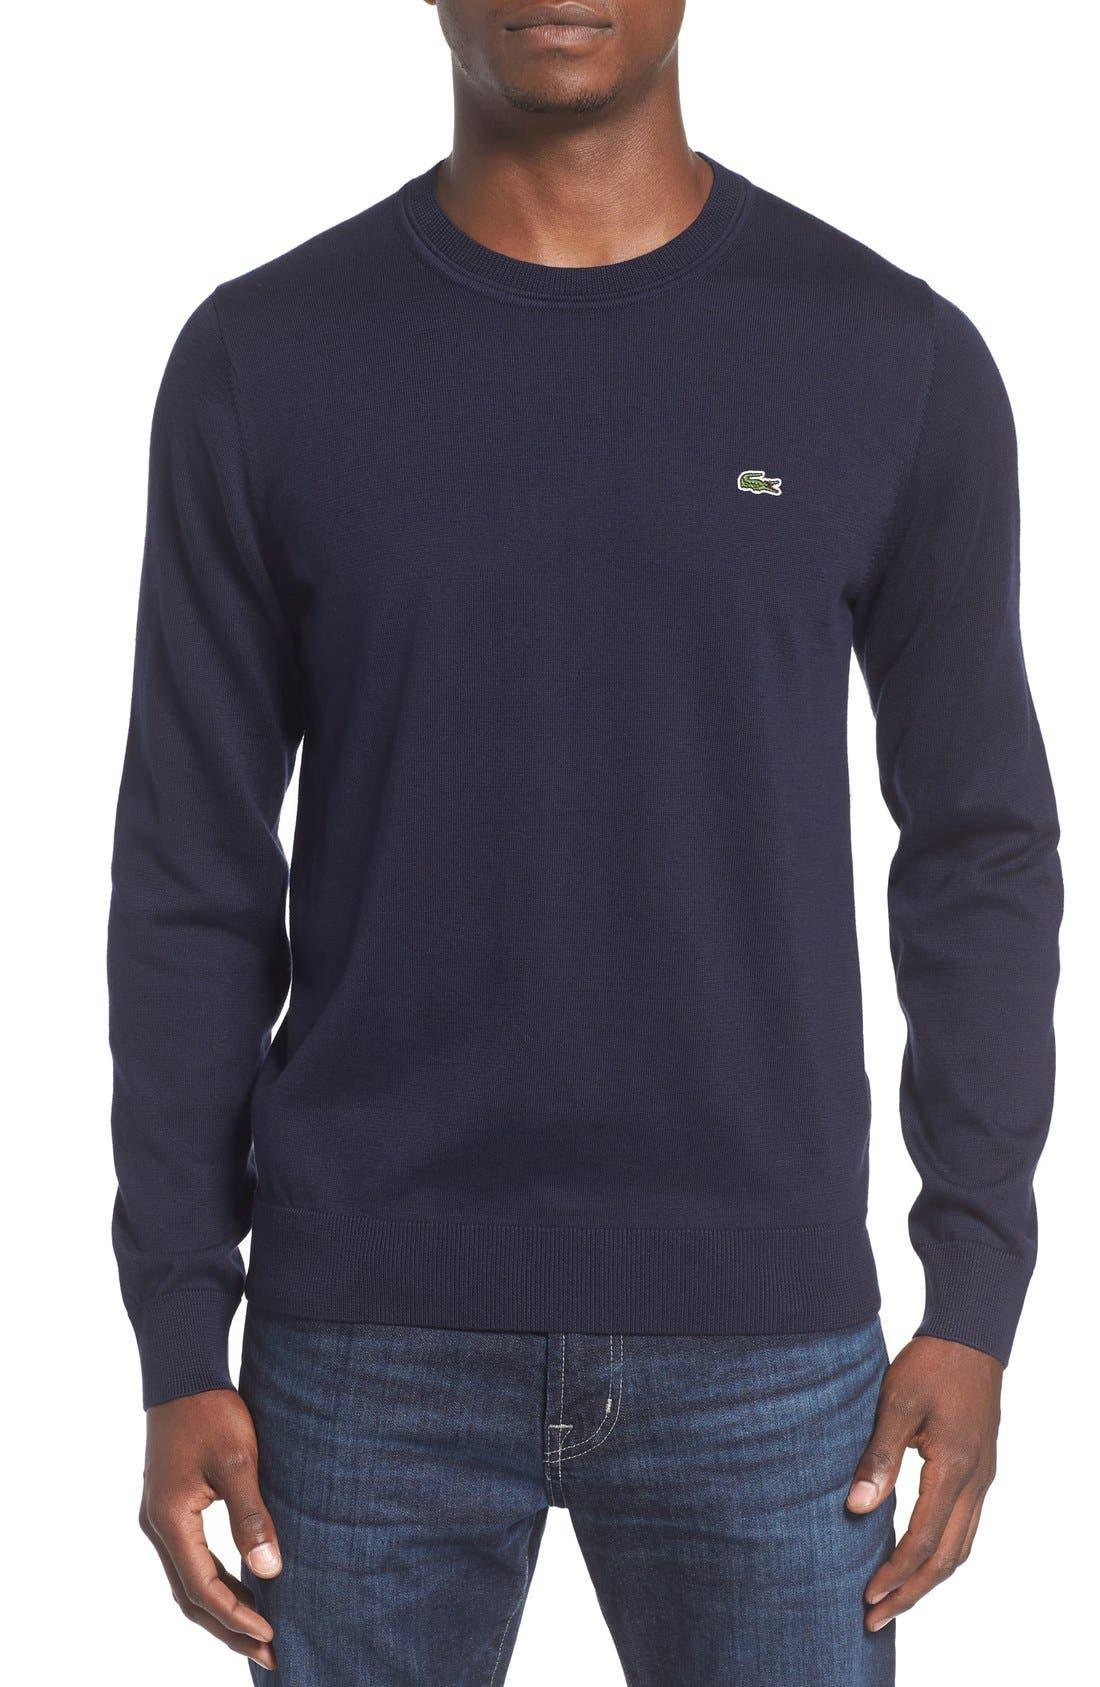 Jersey Knit Crewneck Sweater,                             Main thumbnail 1, color,                             Navy Blue